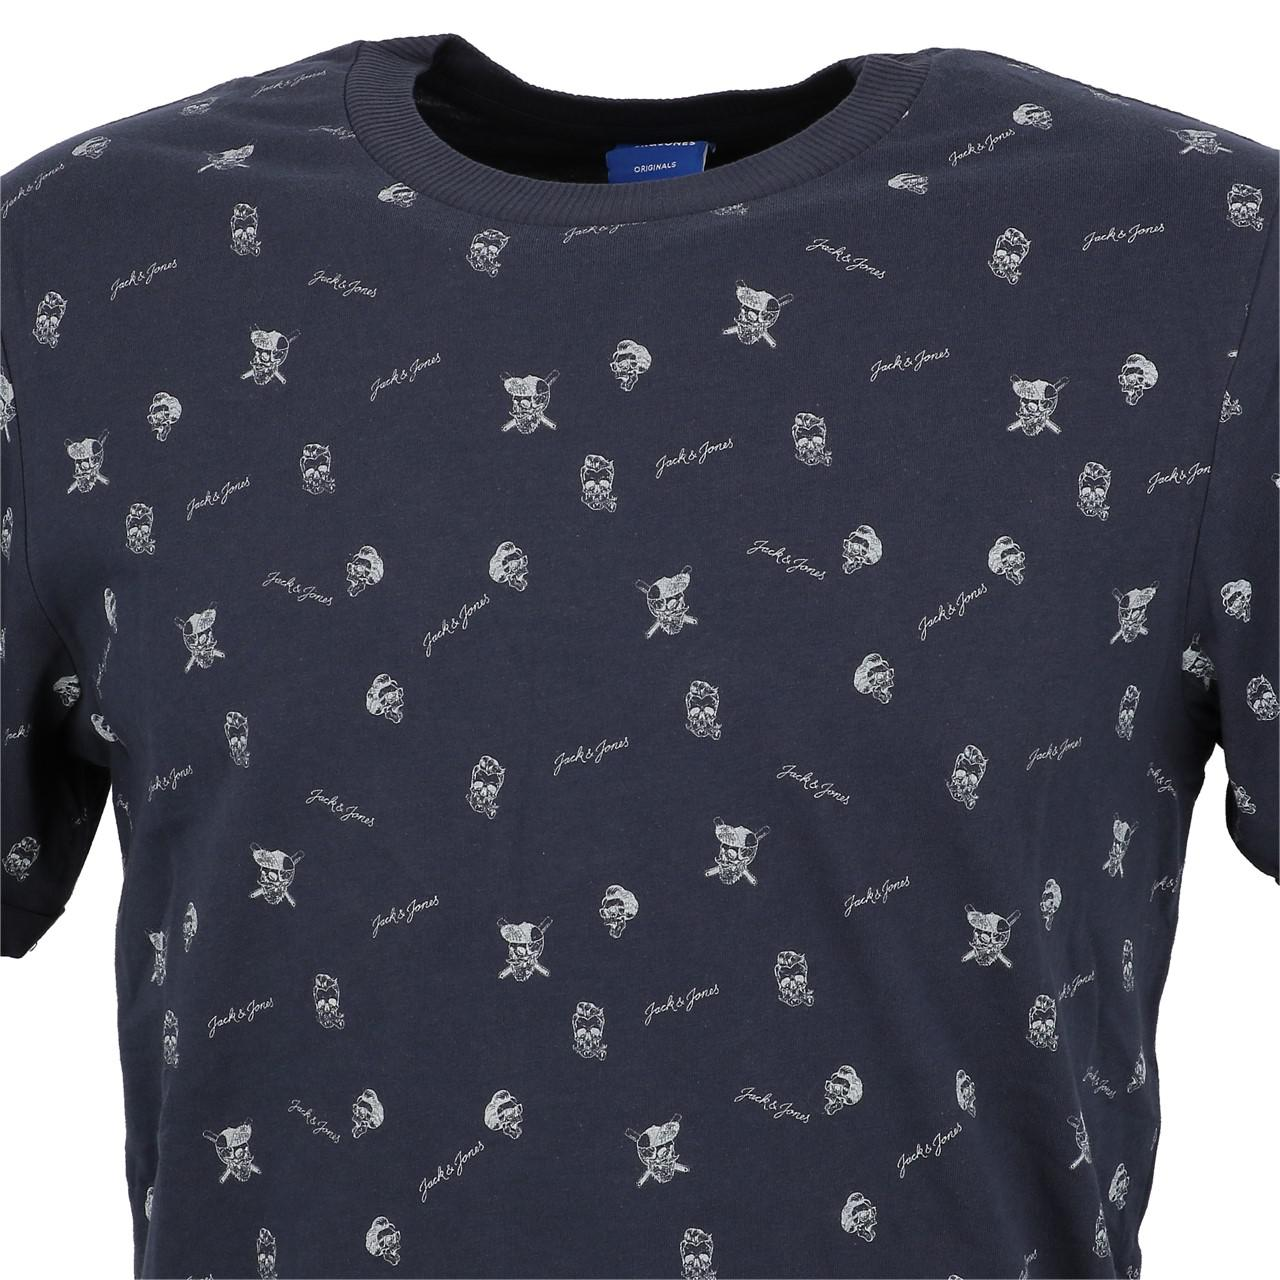 Short-Sleeve-T-Shirt-Jack-and-Jones-Cam-Total-Eclipse-Mc-Tee-Blue-28409-N thumbnail 2